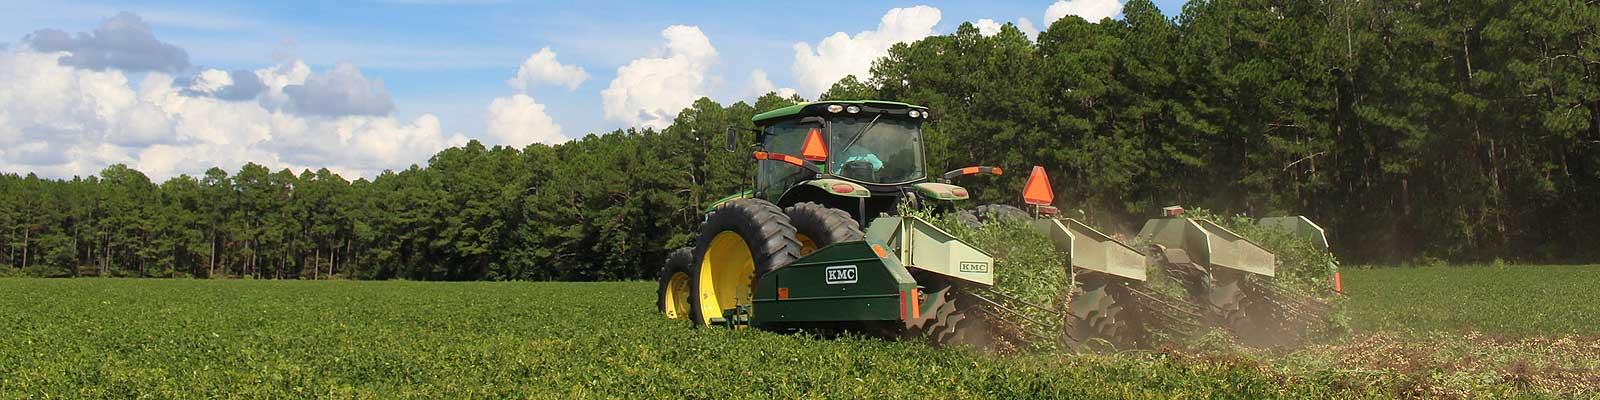 scroller-tractor